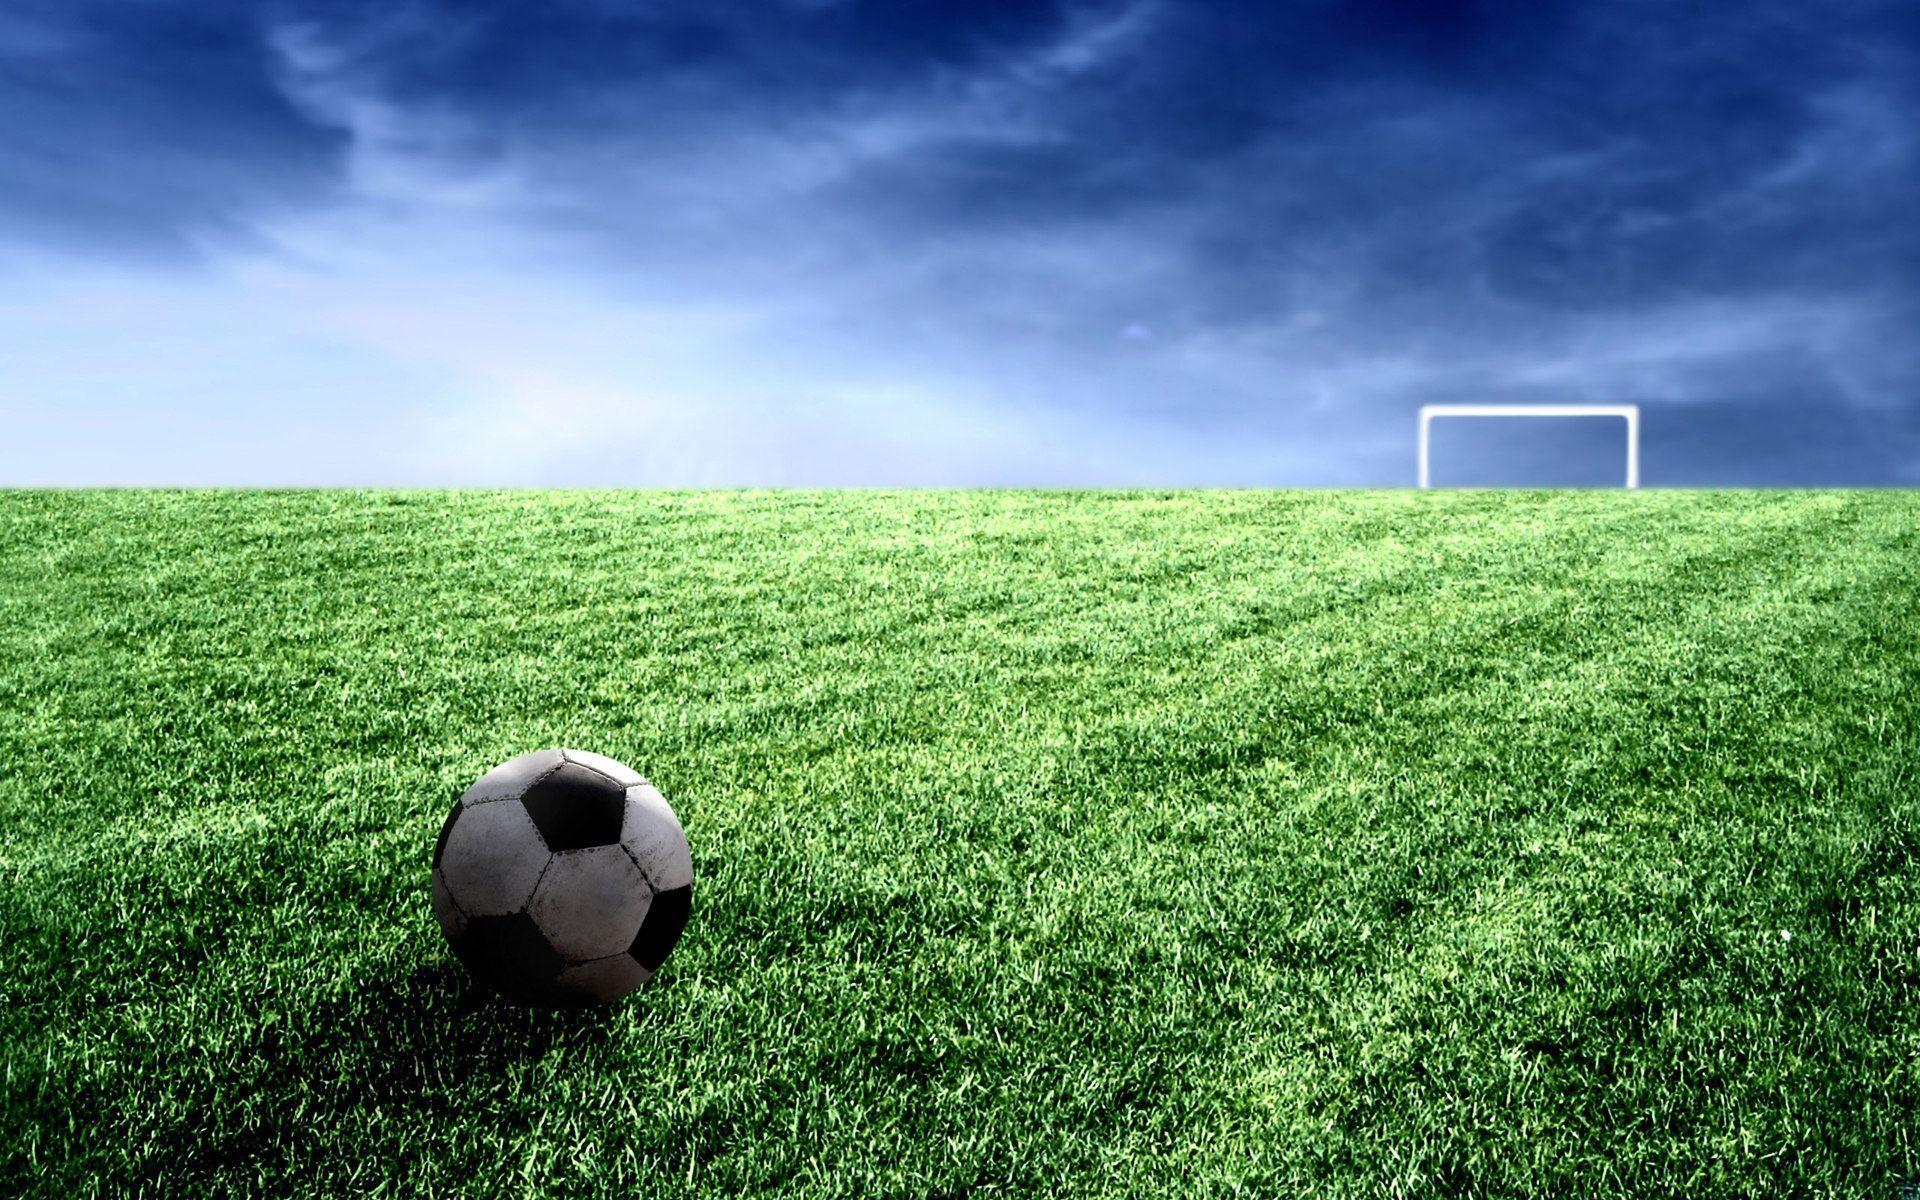 American Football Field Wallpaper Soccer Backgrounds Soccer Ball Soccer